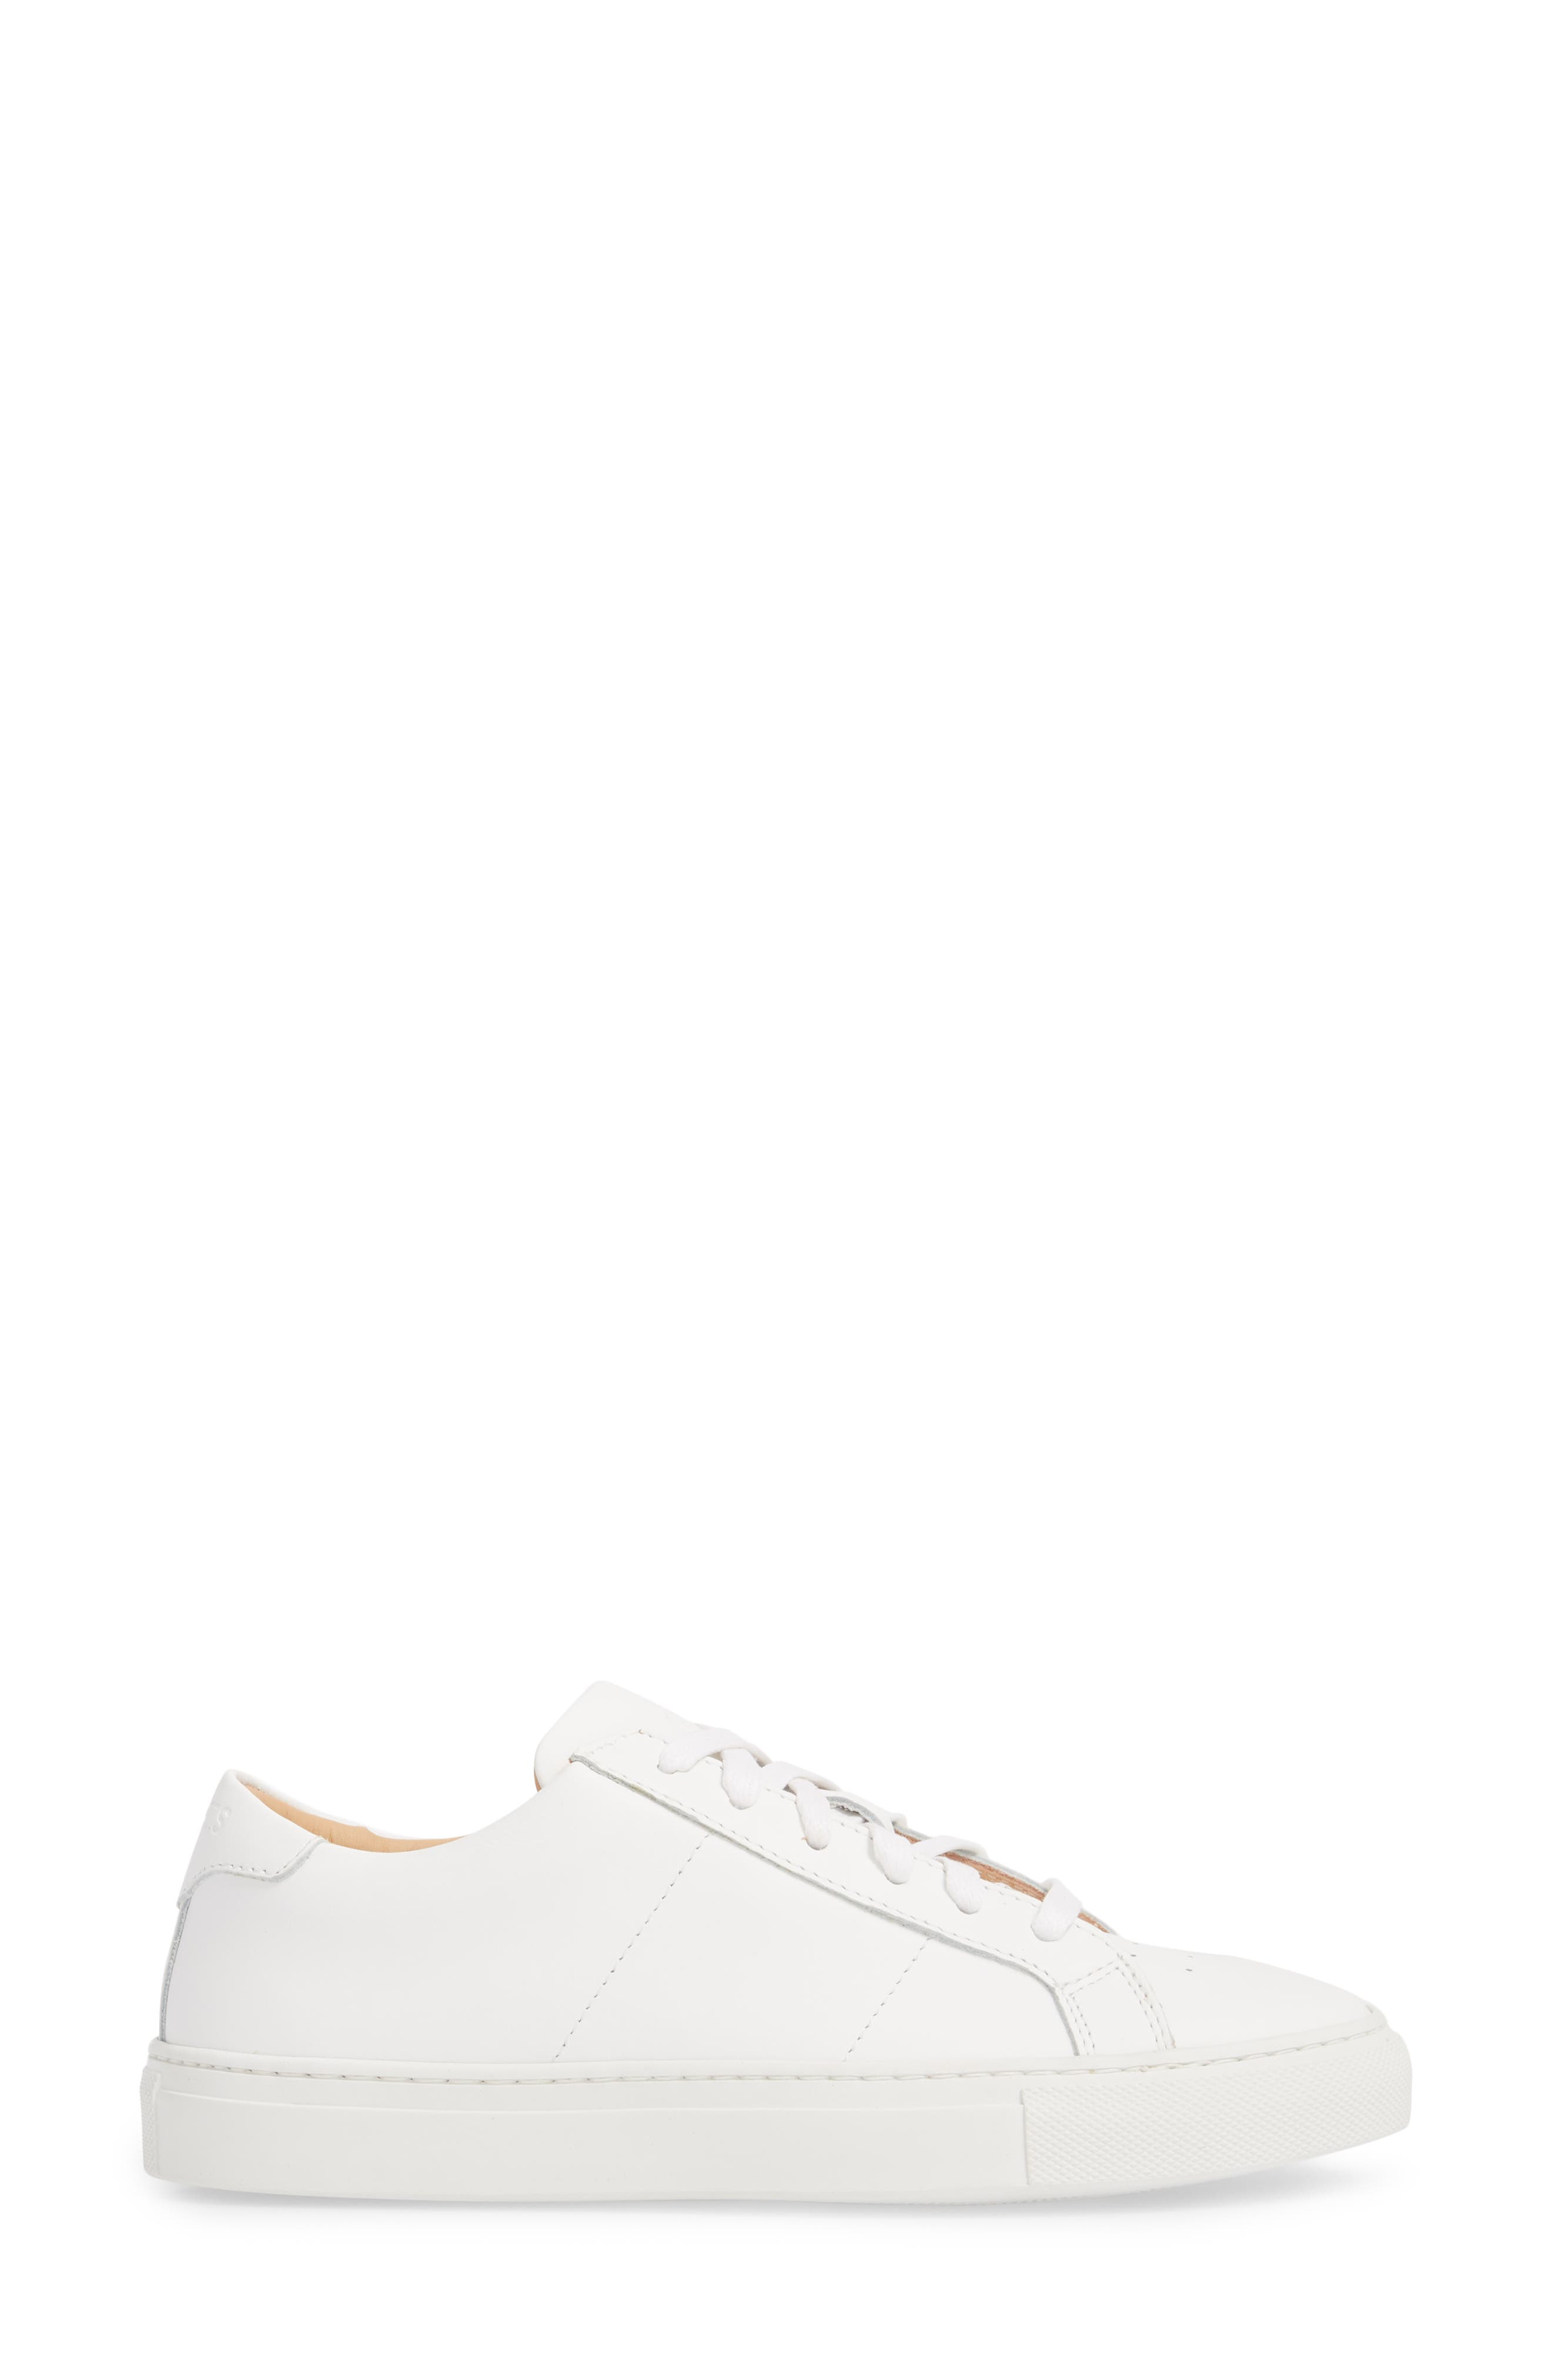 Royale Sneaker,                             Alternate thumbnail 3, color,                             White Flat Leather